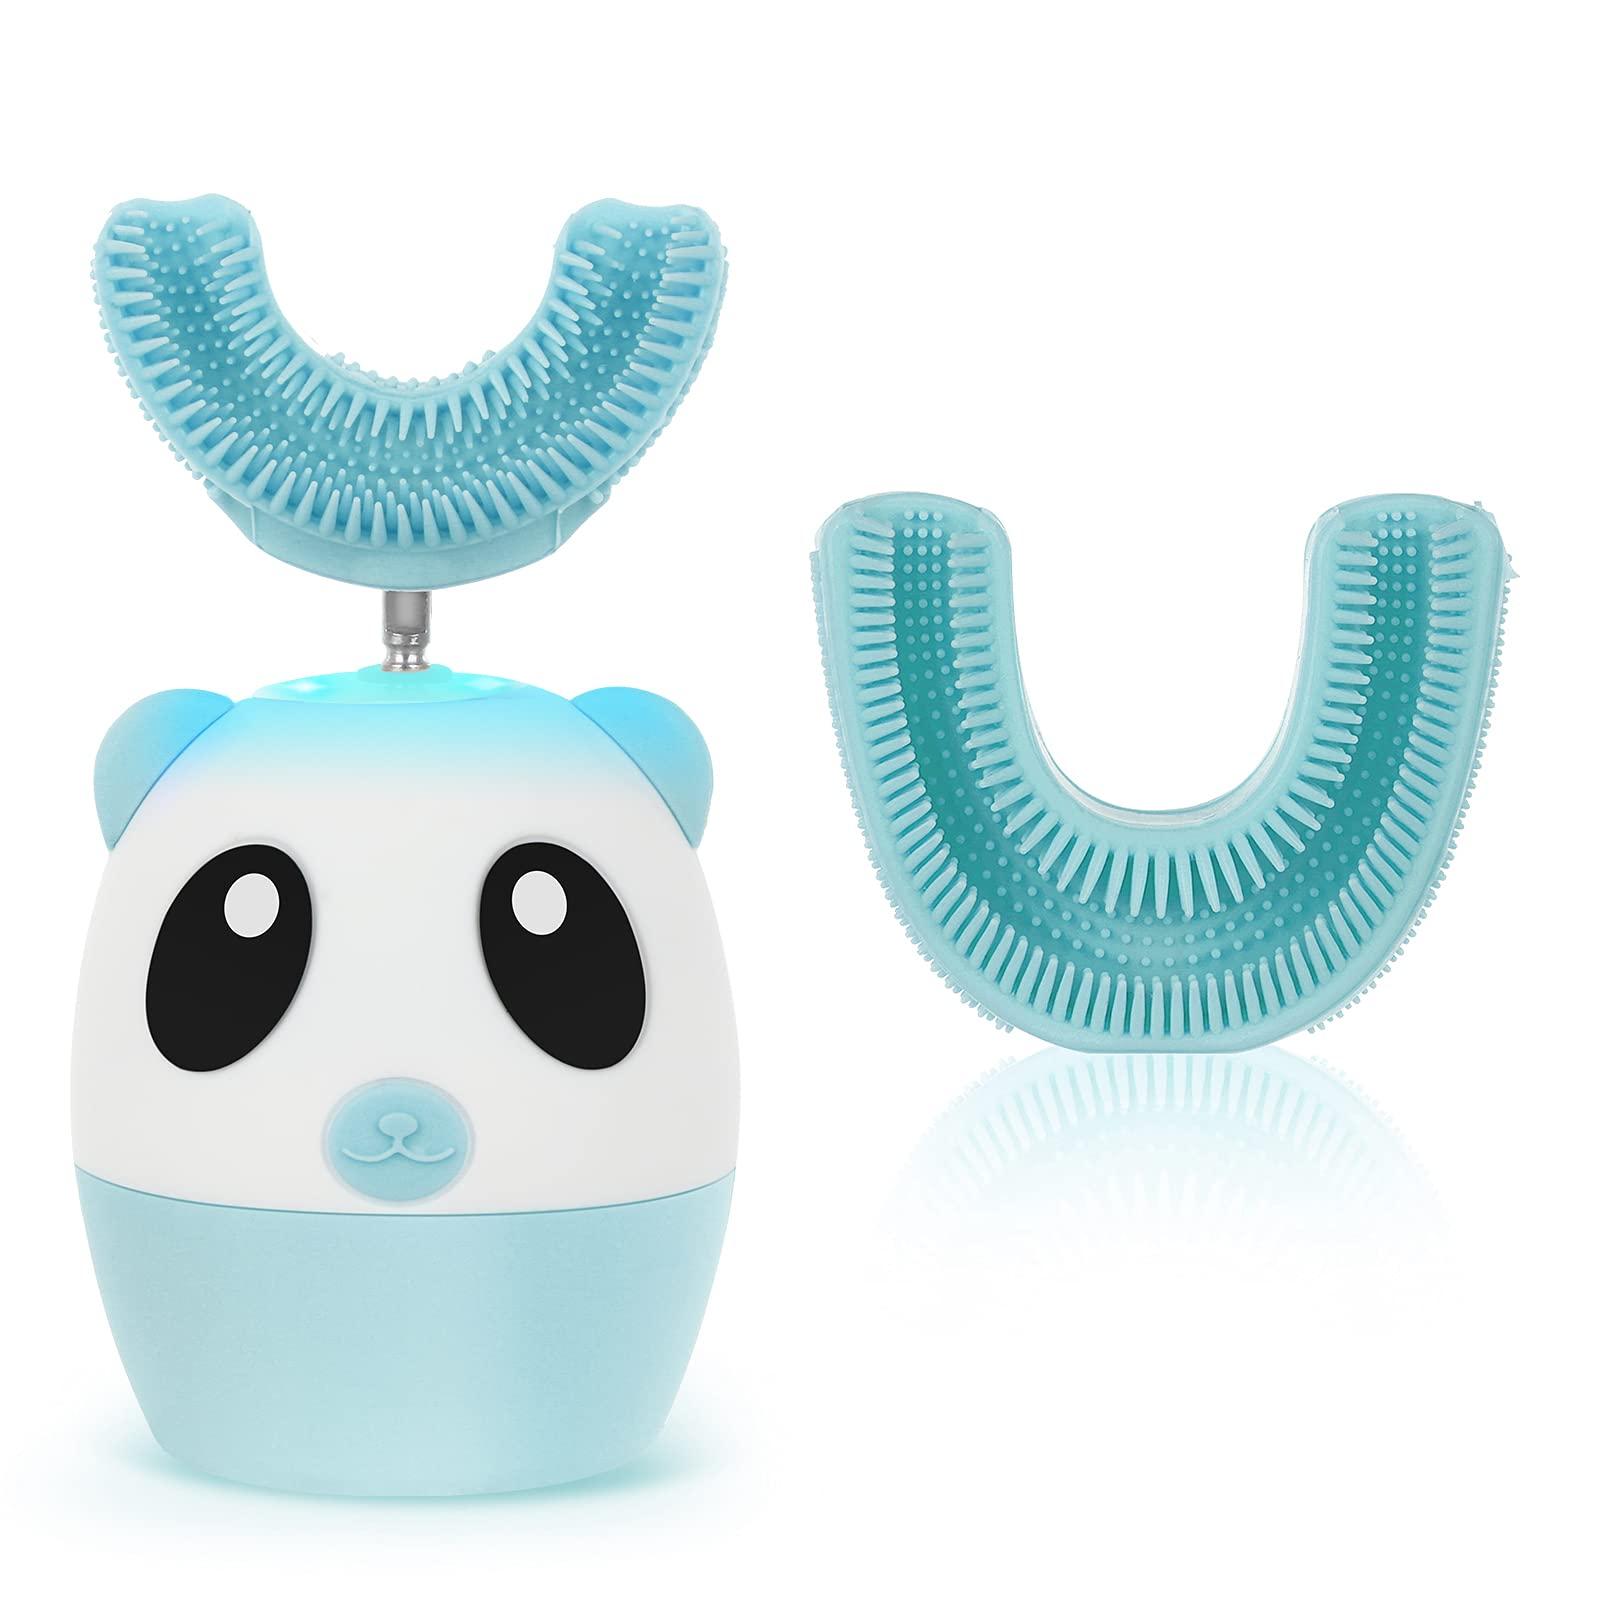 Kids Electric Toothbrush (with 2 Sizes U Shaped Brush) Ultrasonic Automatic Whitening